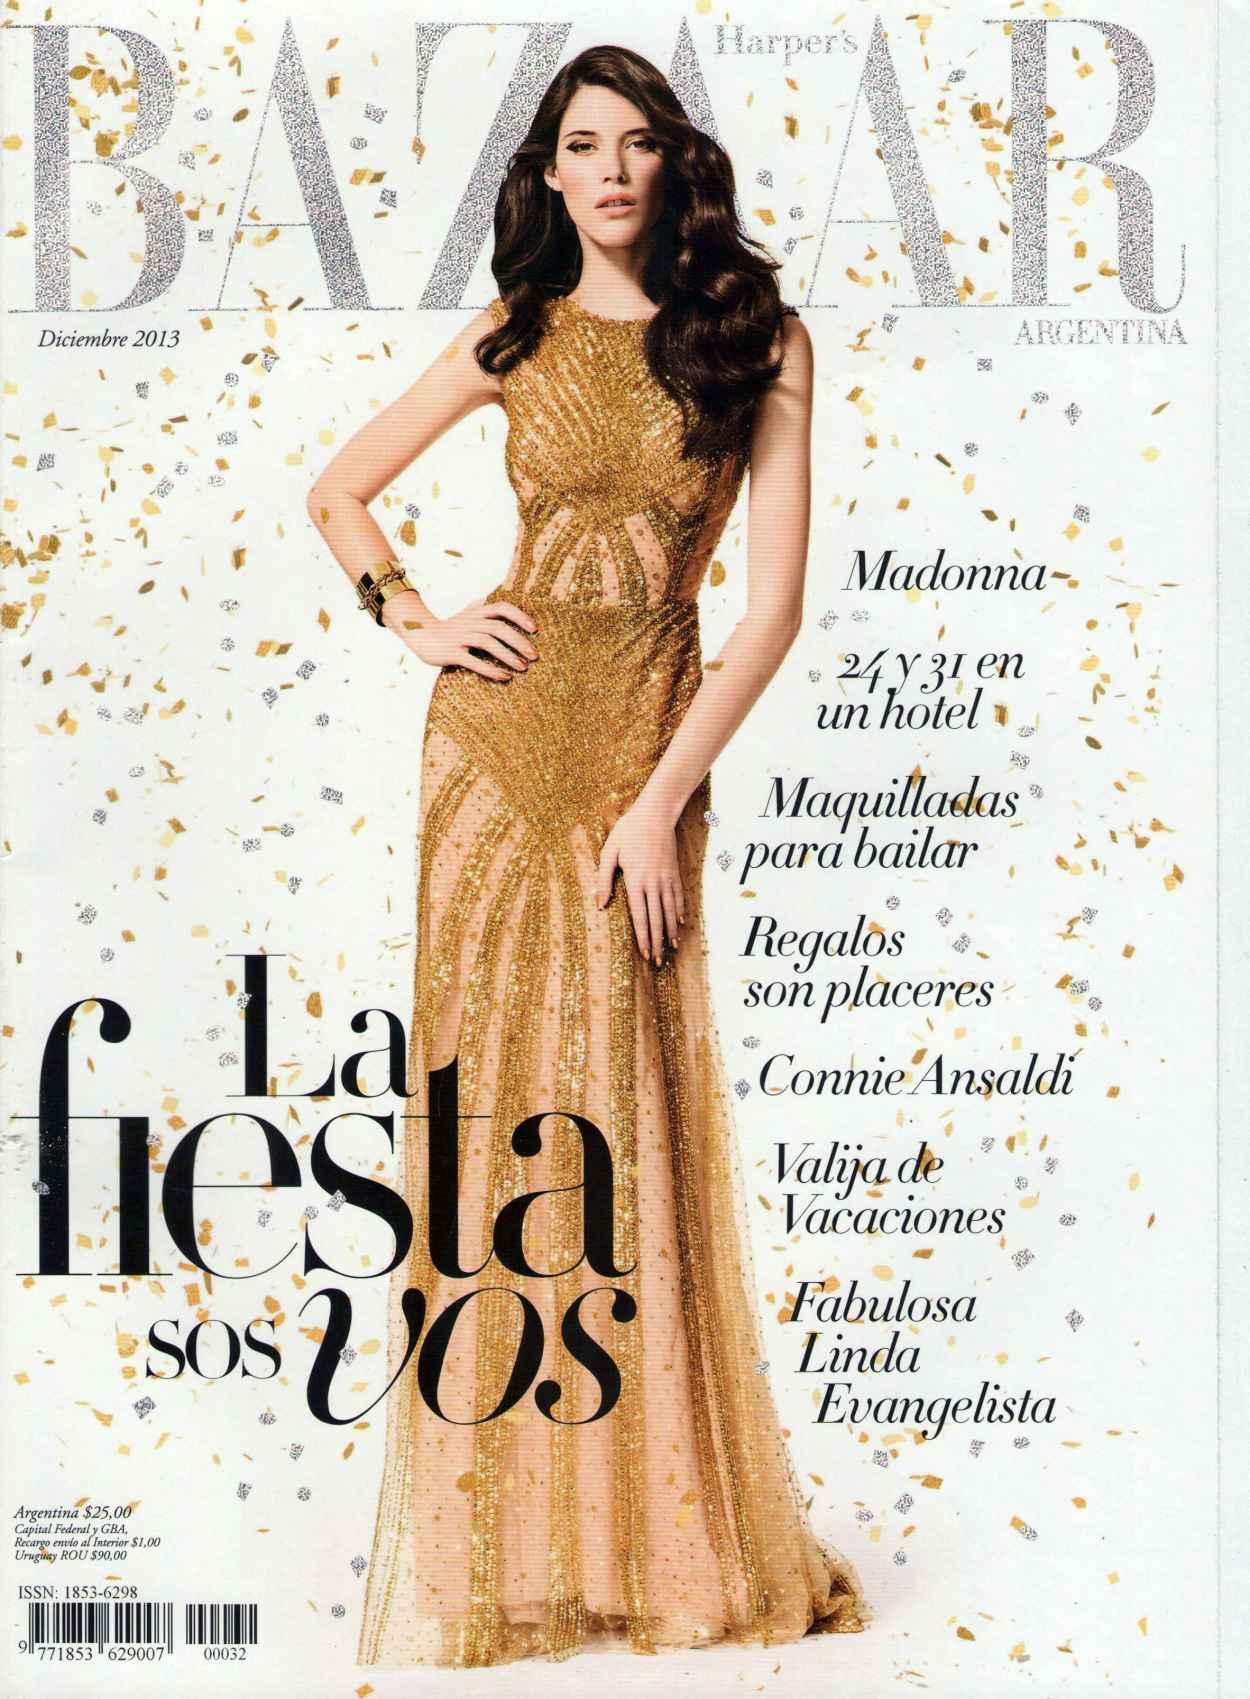 Carla Ciffoni - HARPERS BAZAAR (Argentina) - December 2015 Issue-1